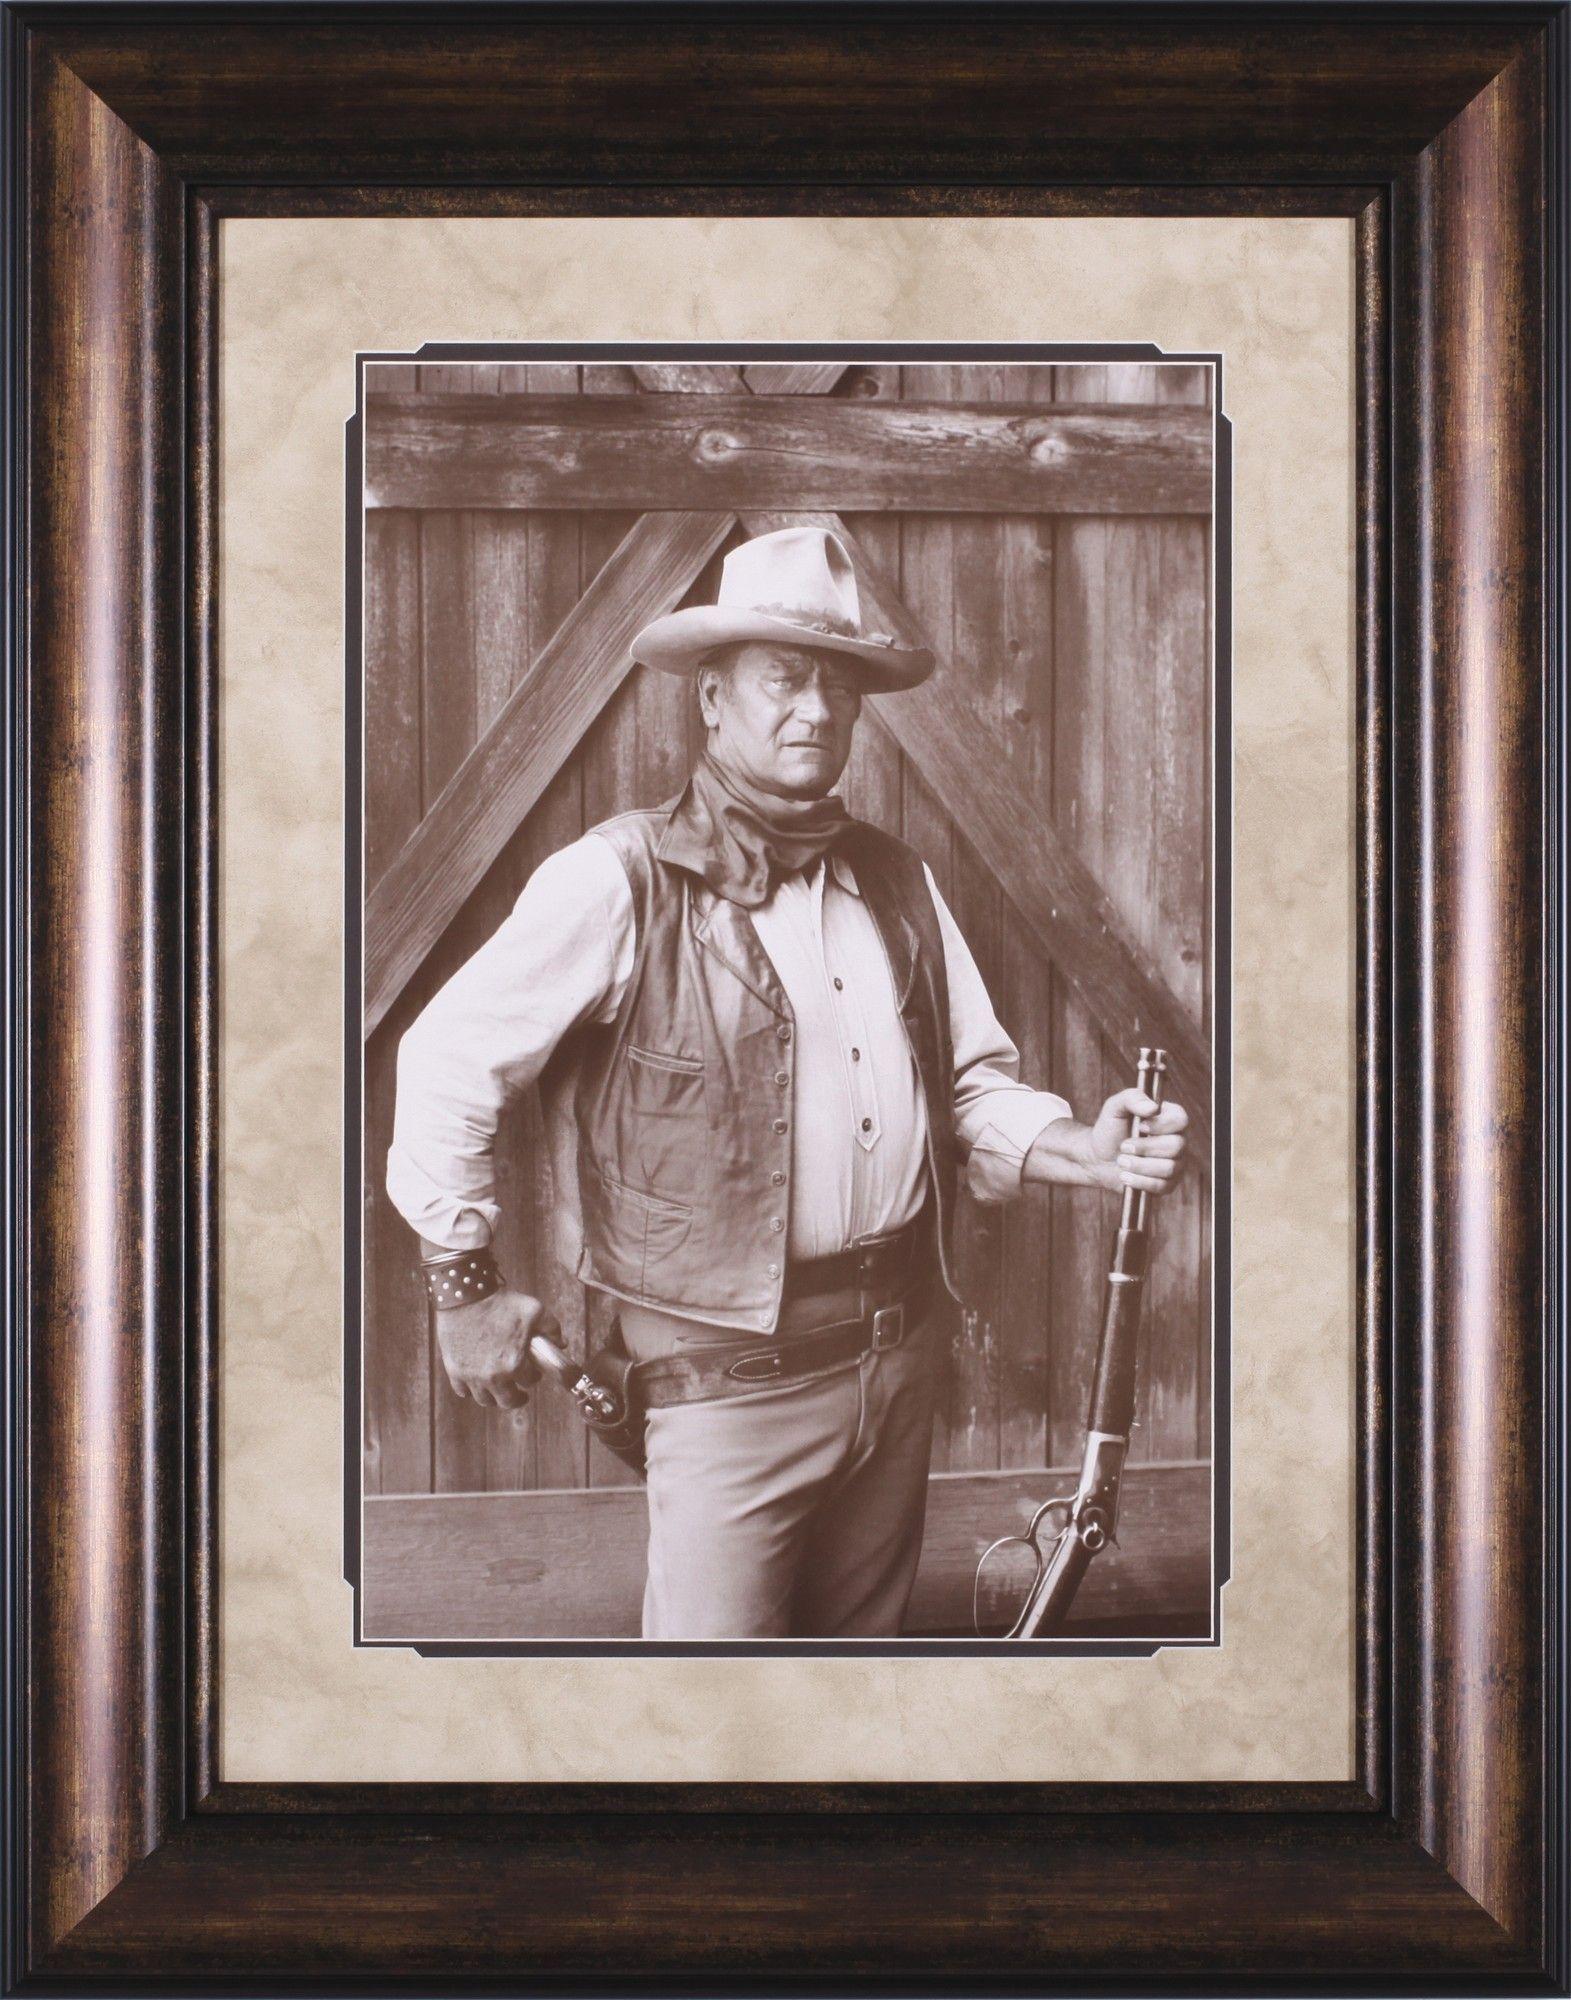 John Wayne By Bob Willoughby Framed Photographic Print Wall Art Framed Art Wall Art Prints